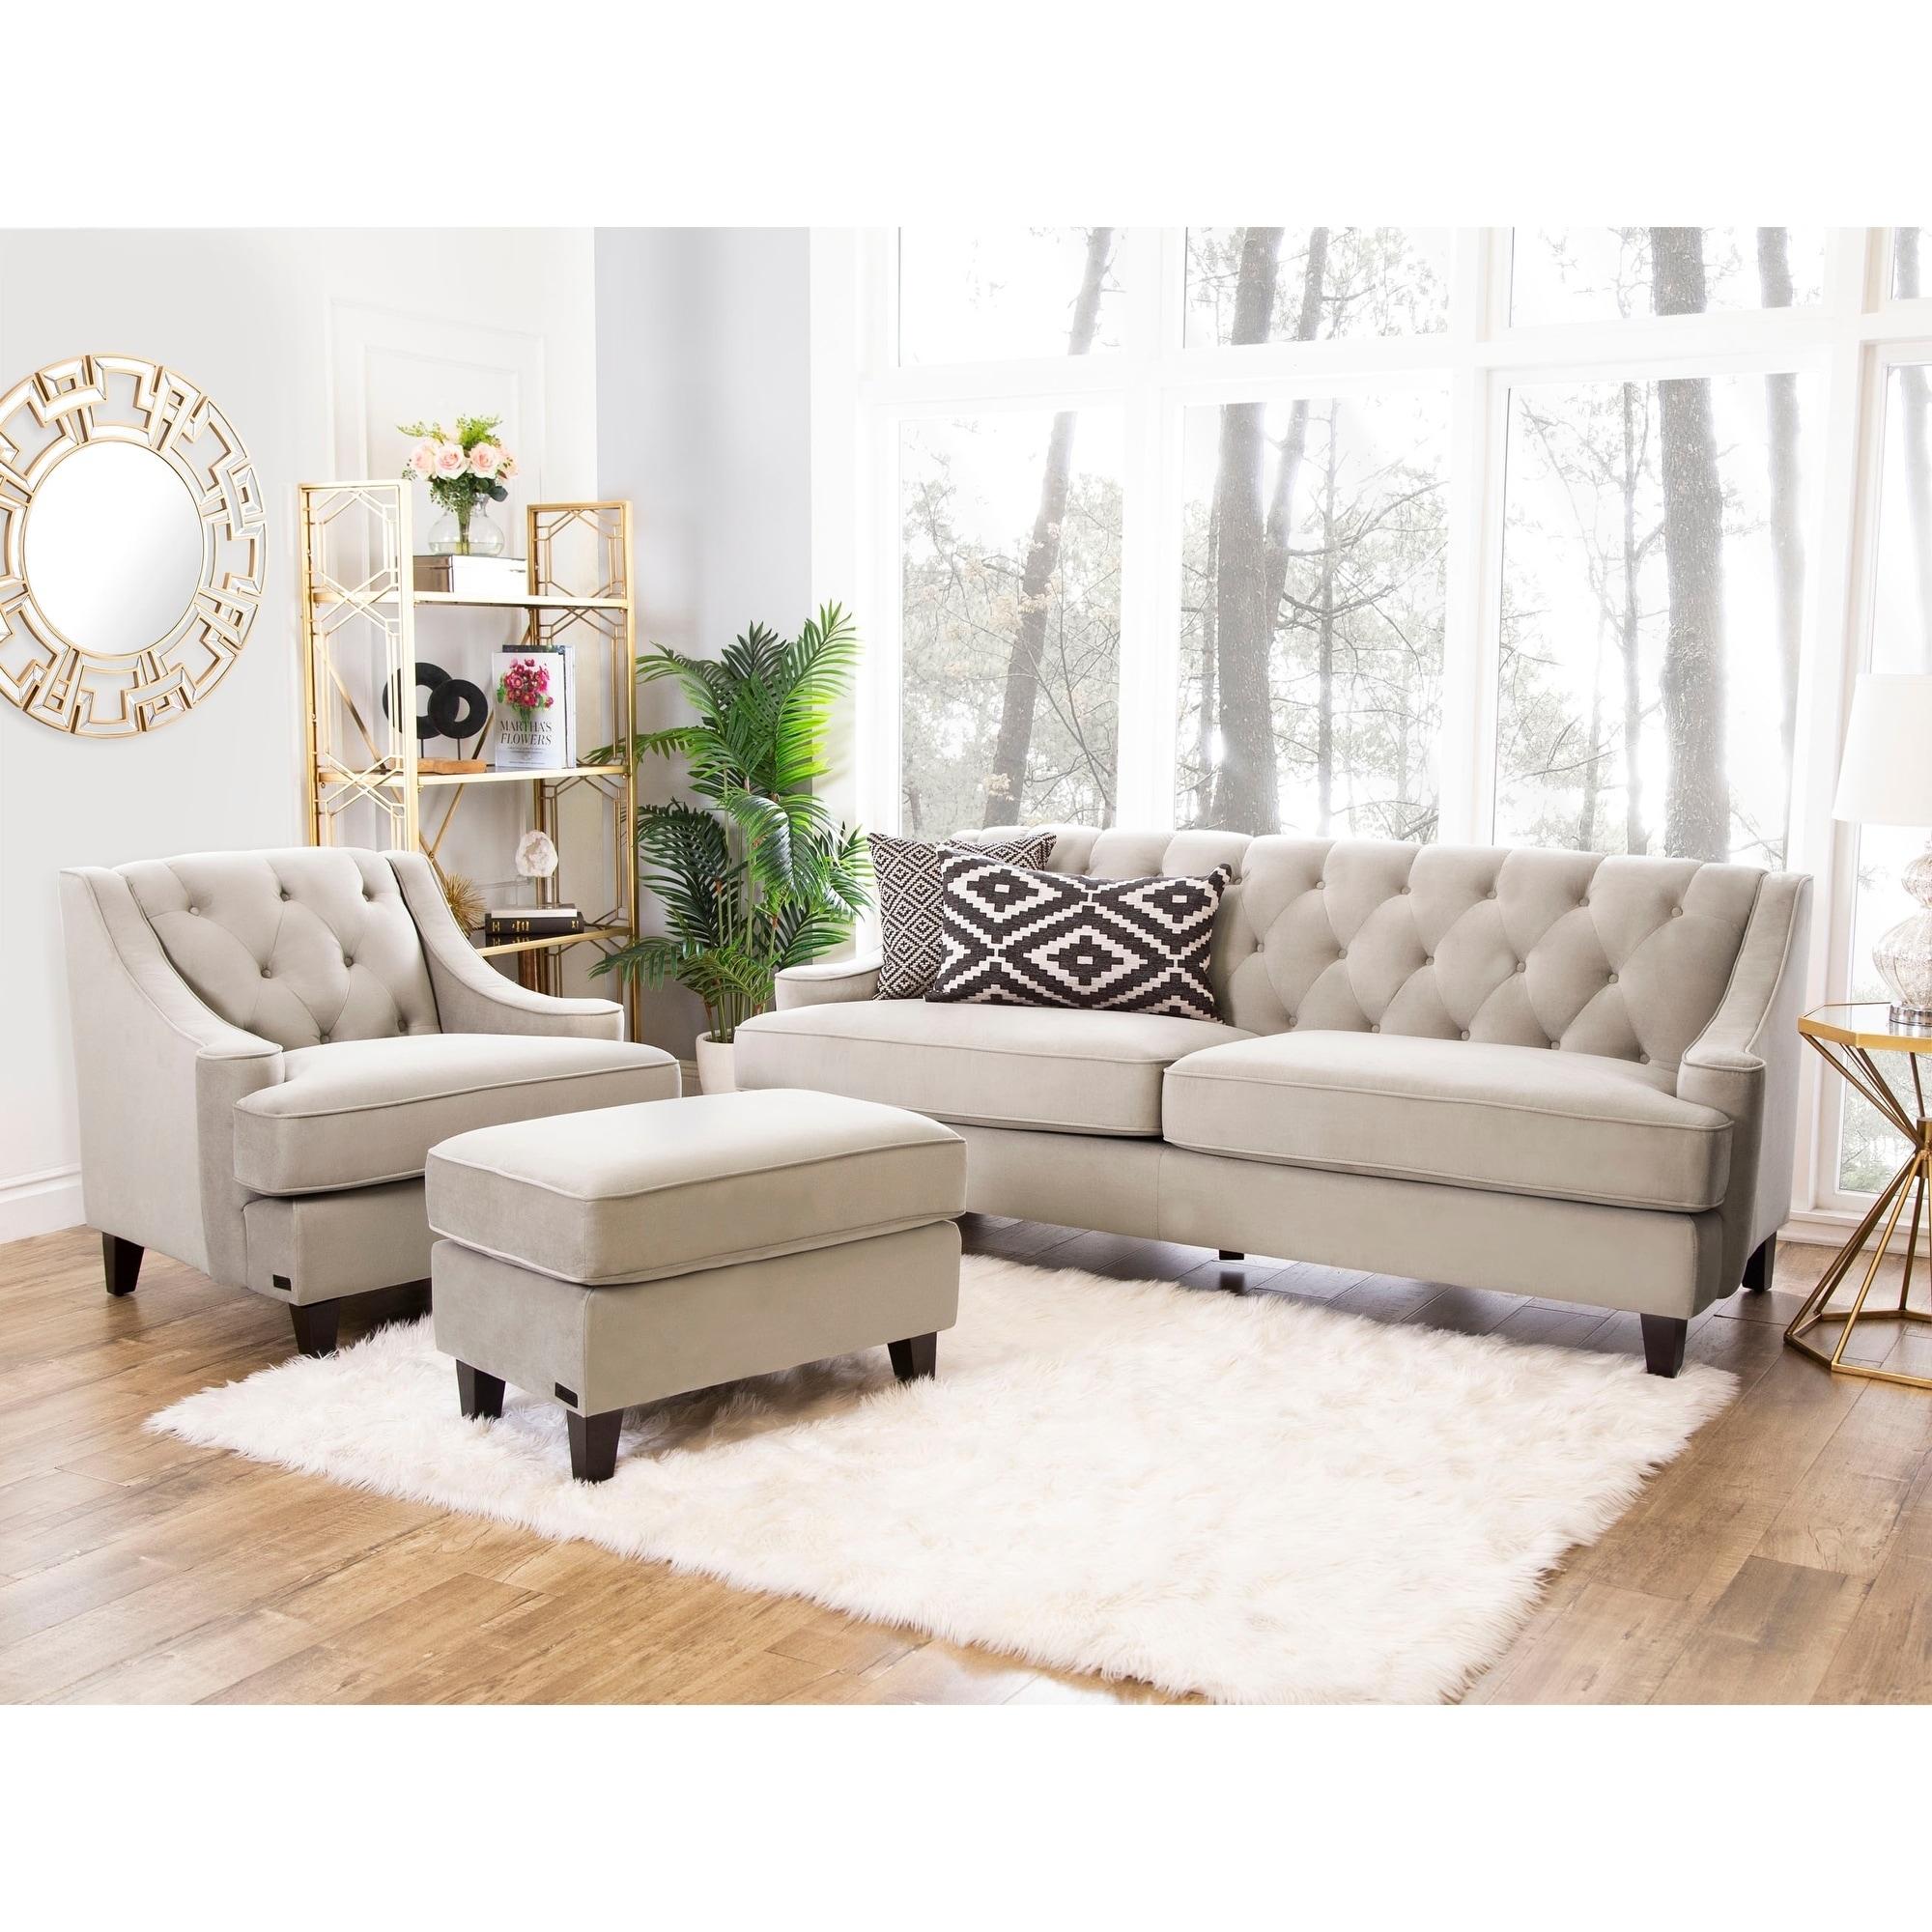 Abbyson Claridge Taupe Velvet 3 Piece Living Room Set